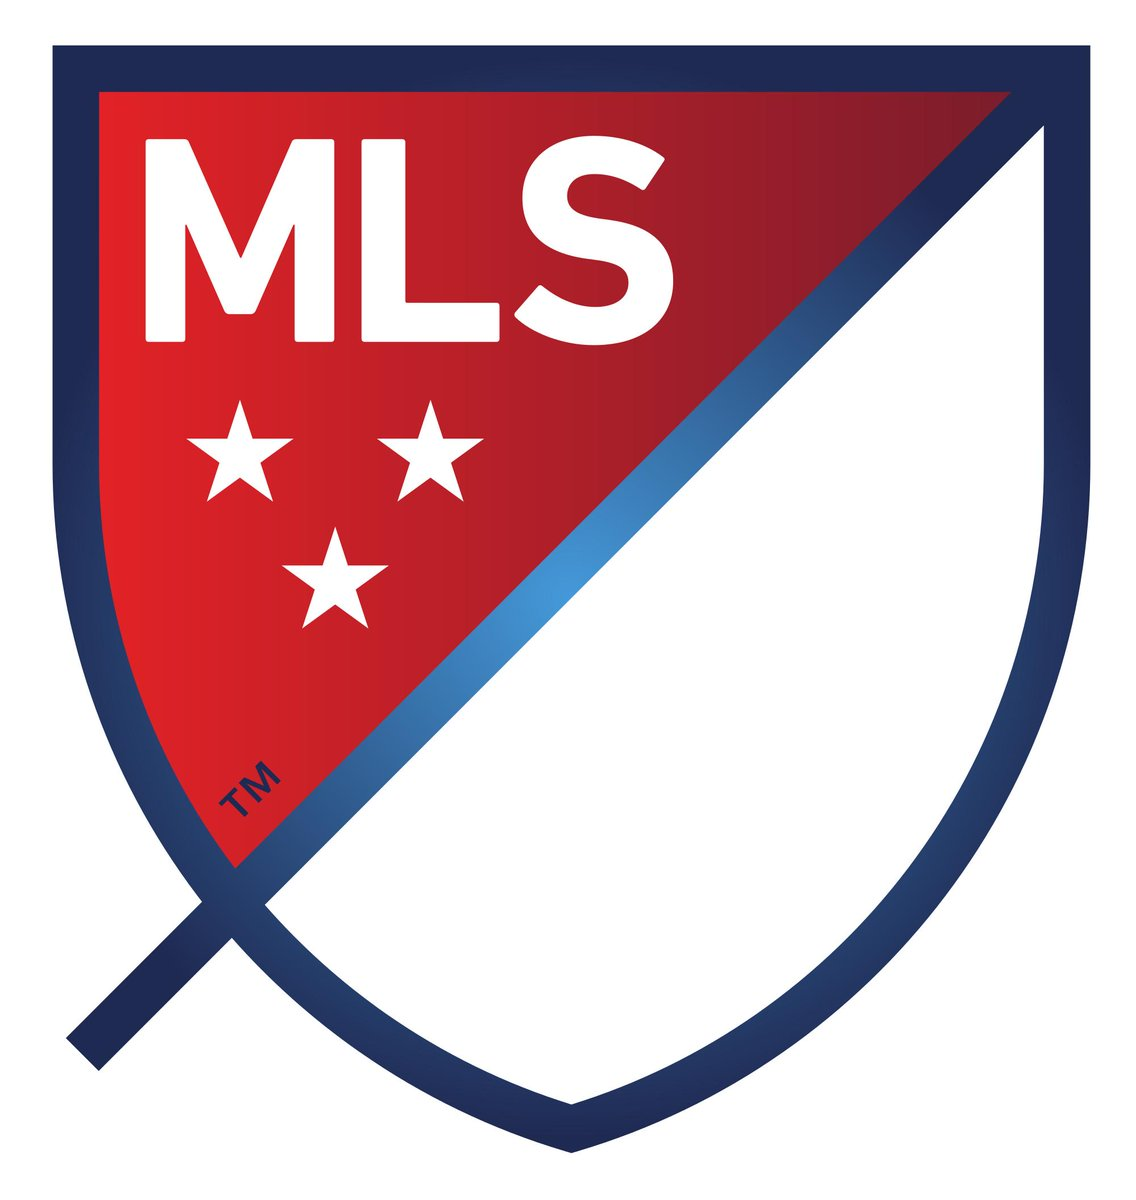 Marketing & Fan Development Intern - Fall 2019 - Sporting Kansas City (Kansas City, MO) https://t.co/Xm3NebpFqz https://t.co/UdJimgsLl0